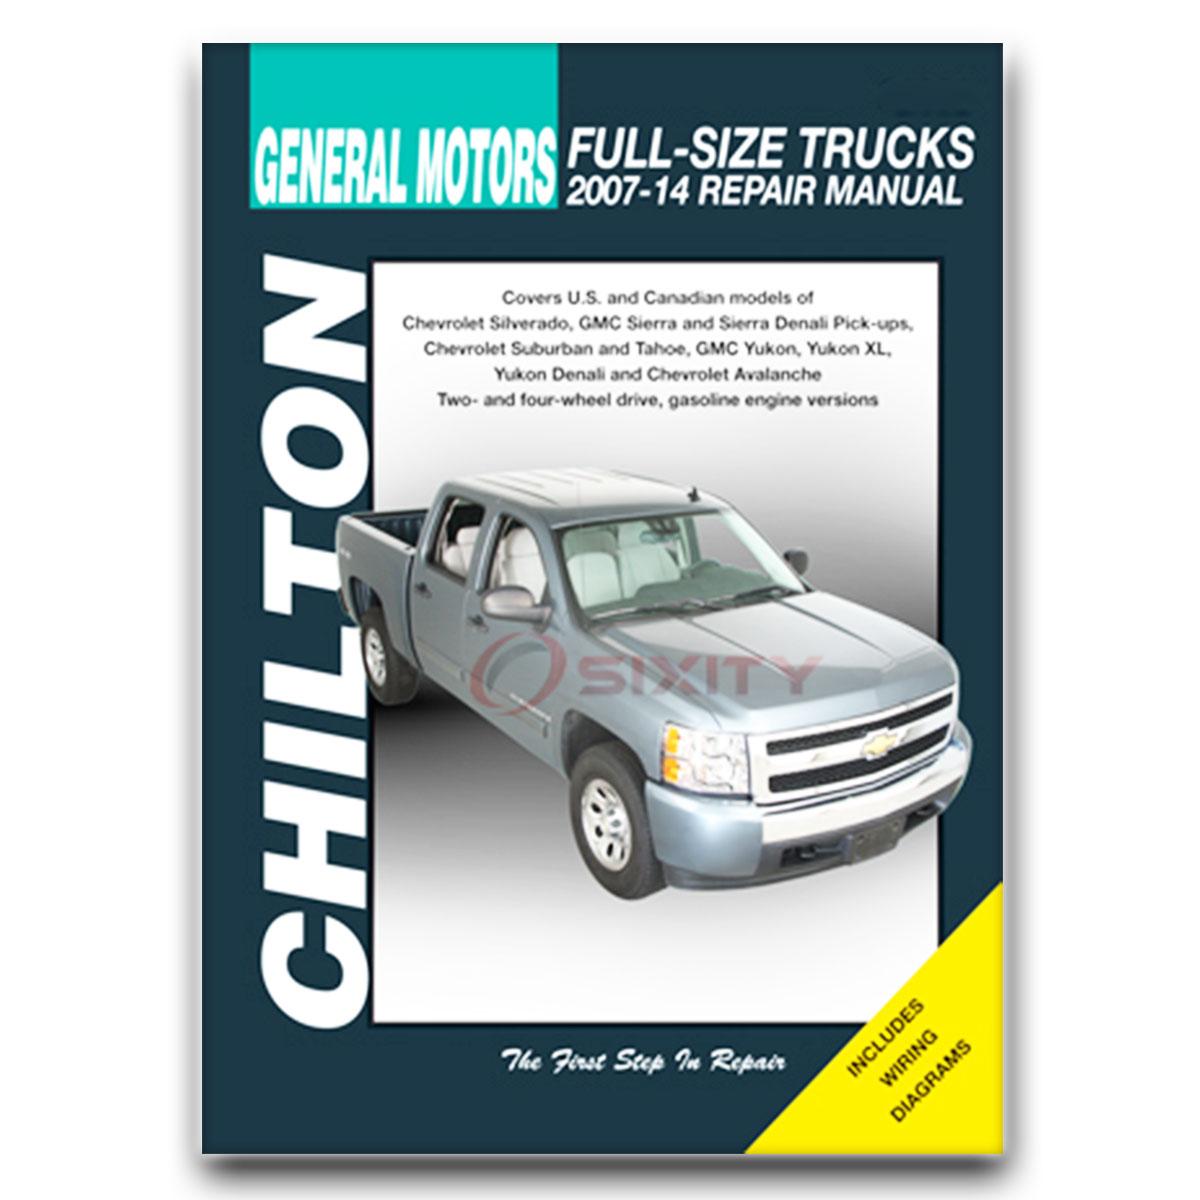 gmc yukon xl 1500 chilton repair manual denali sle slt shop service rh ebay com 2017 GMC Yukon Denali 2007 gmc yukon denali parts manual